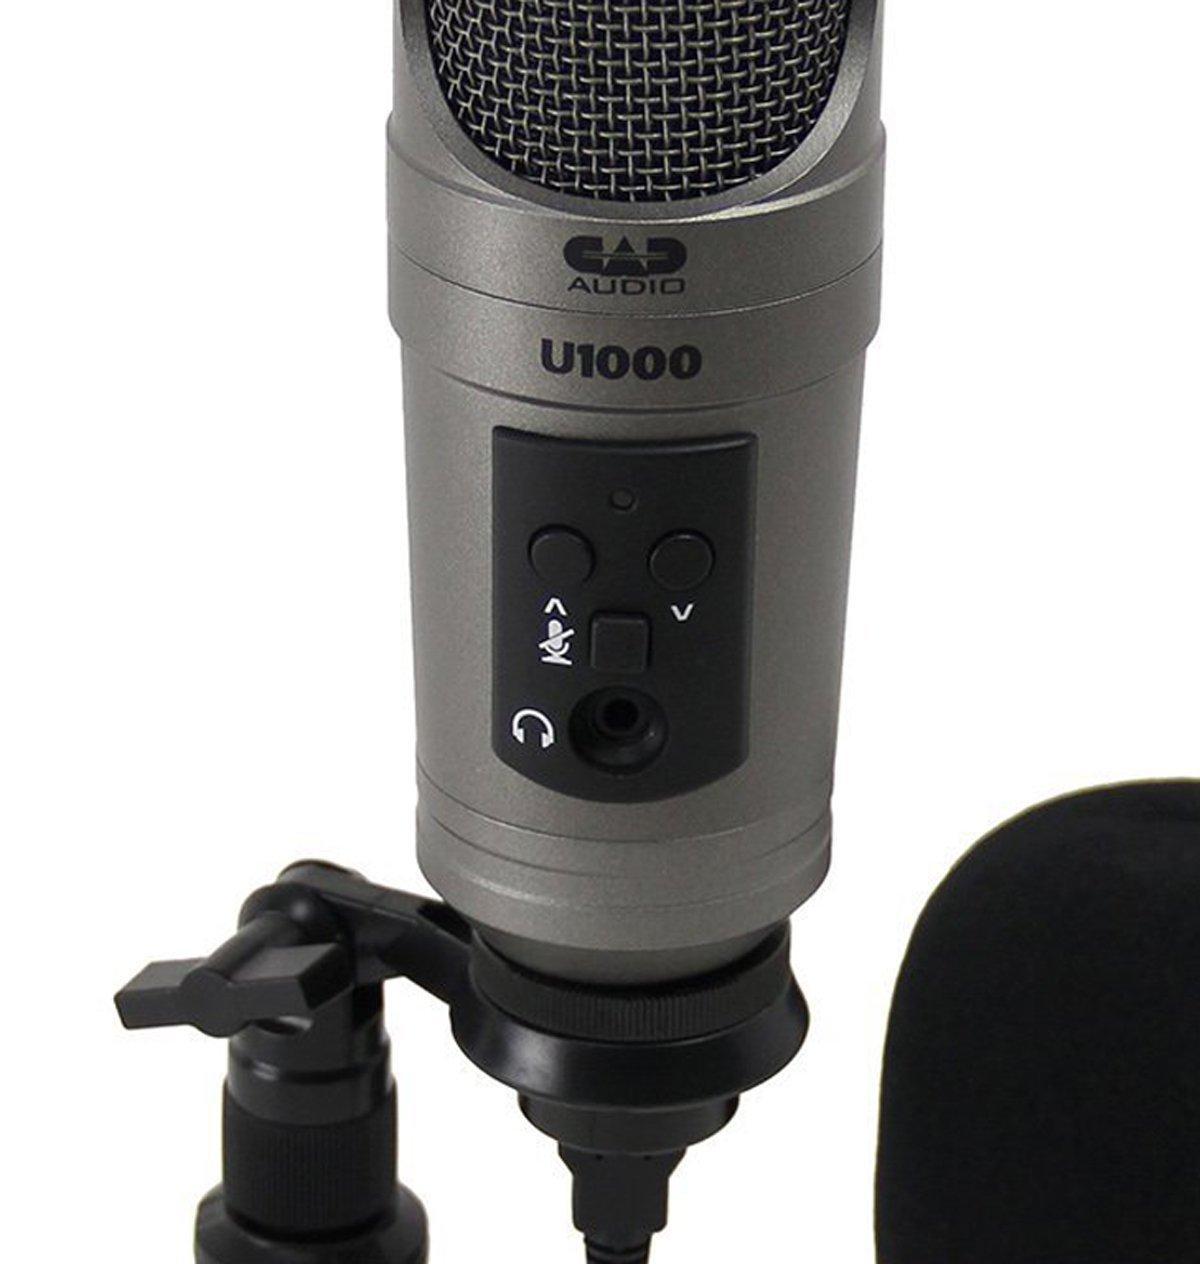 cad u1000 usb studio condenser microphone musical instruments. Black Bedroom Furniture Sets. Home Design Ideas